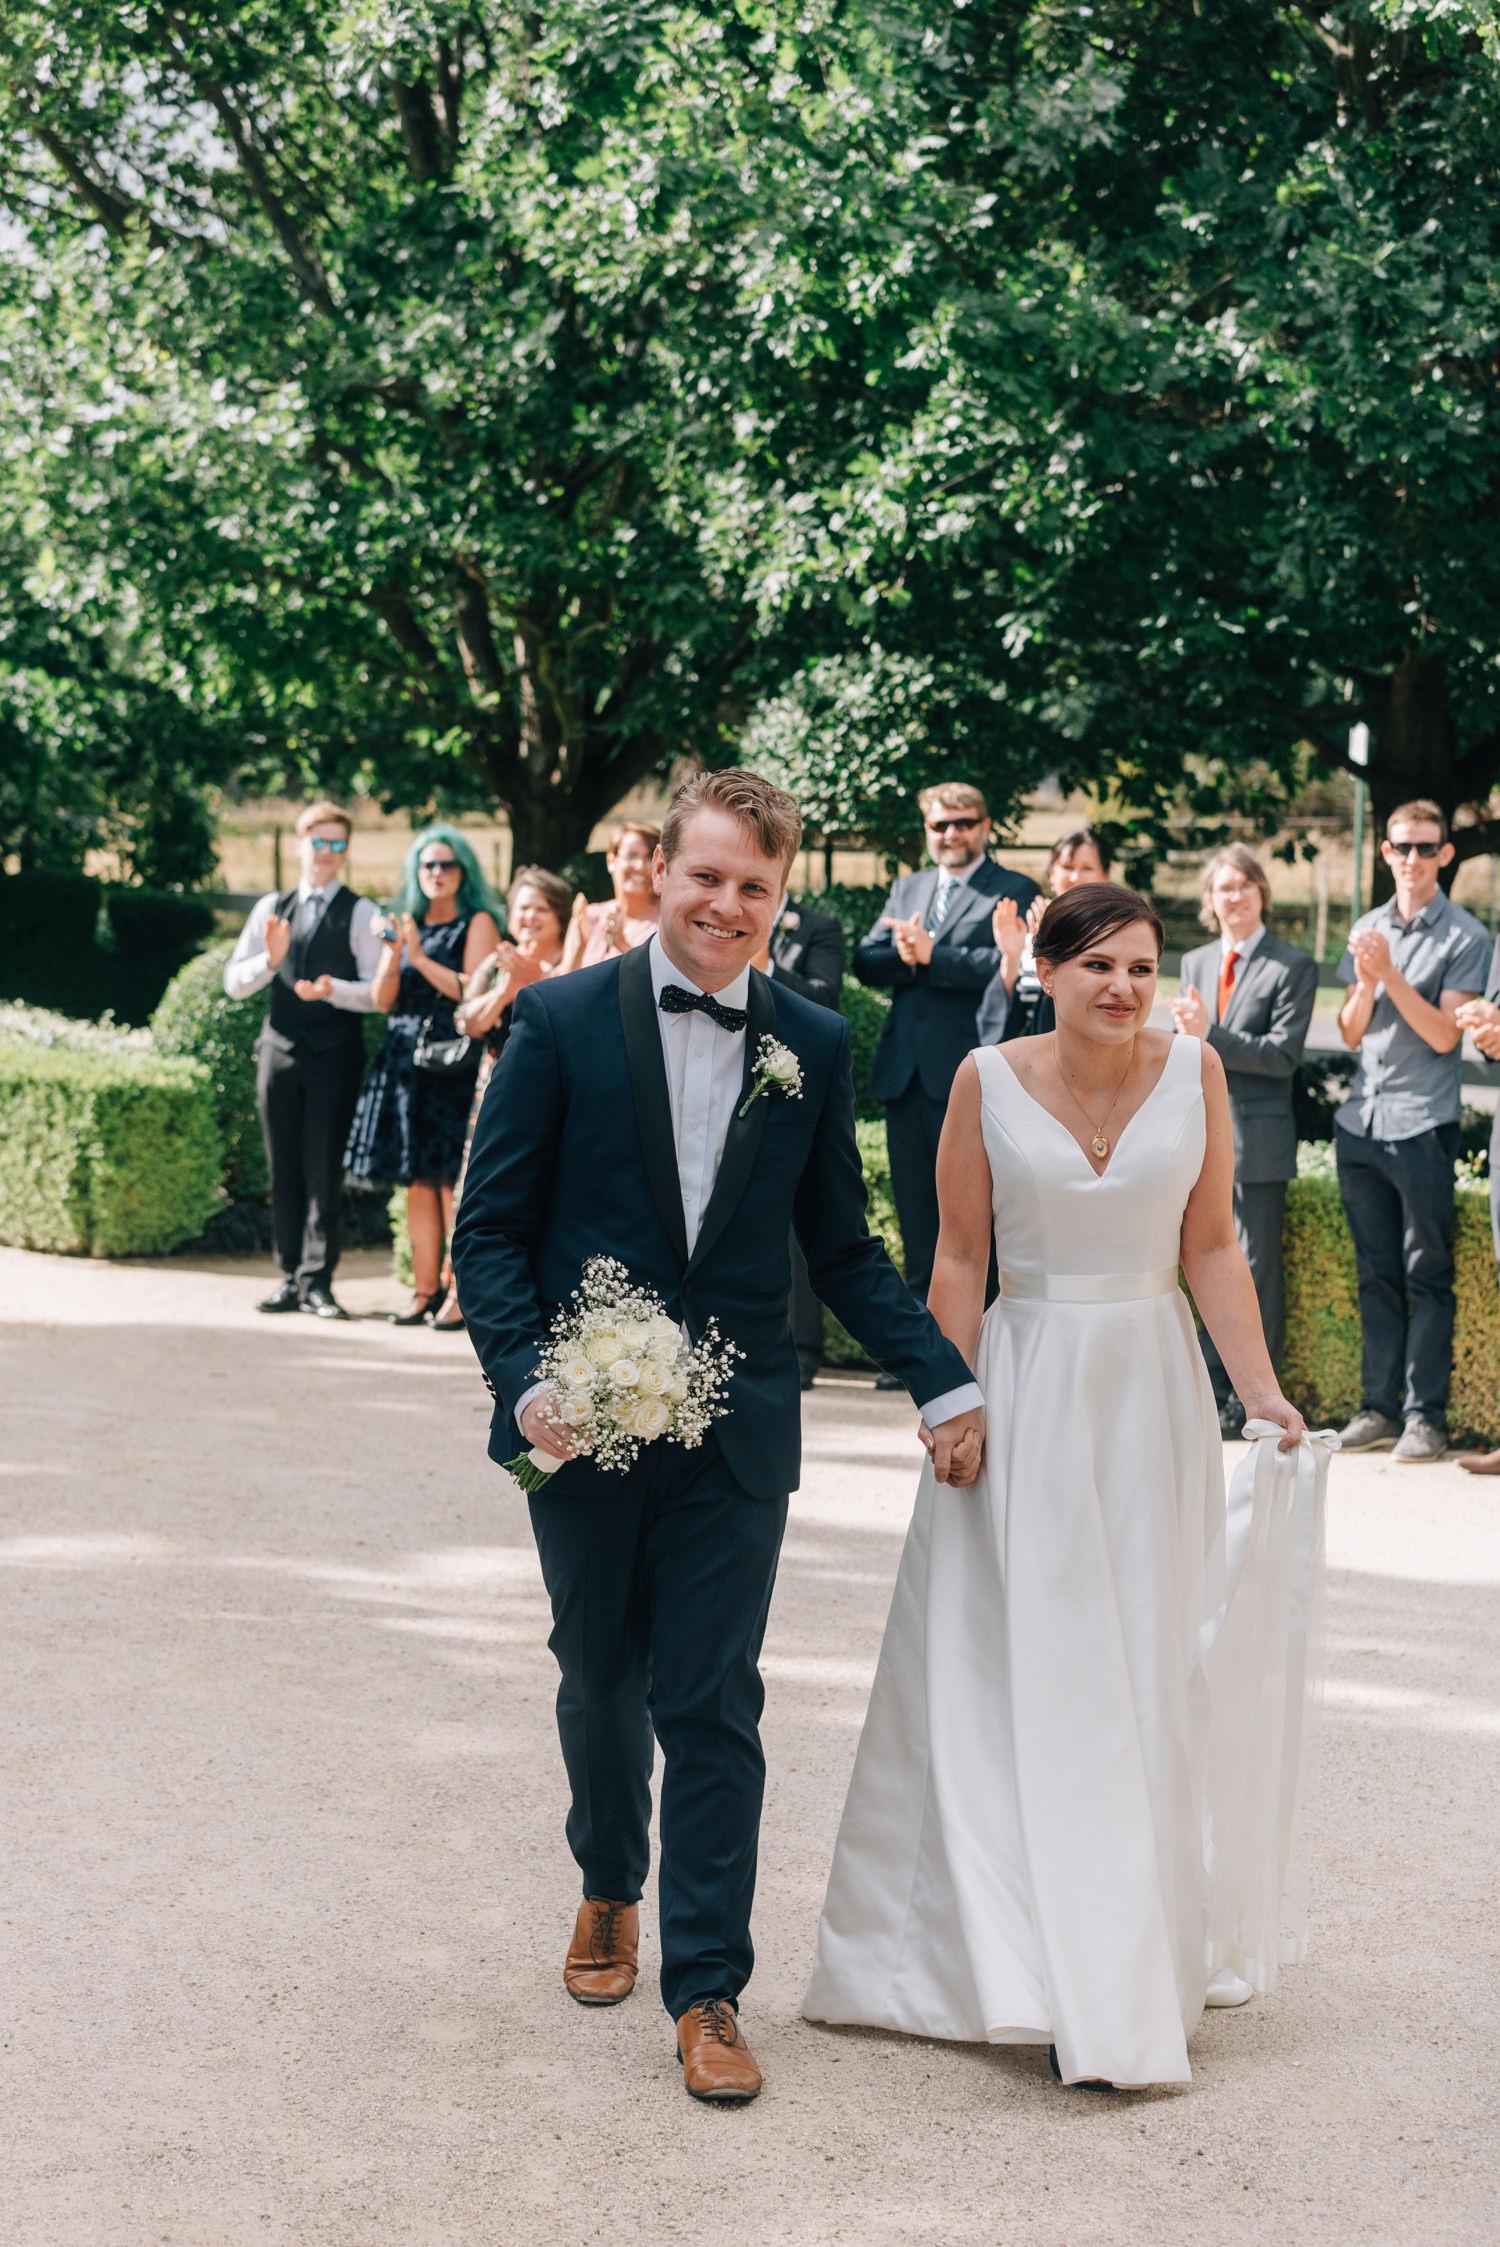 Josef-Chromy-Wedding-Photographer-80.jpg